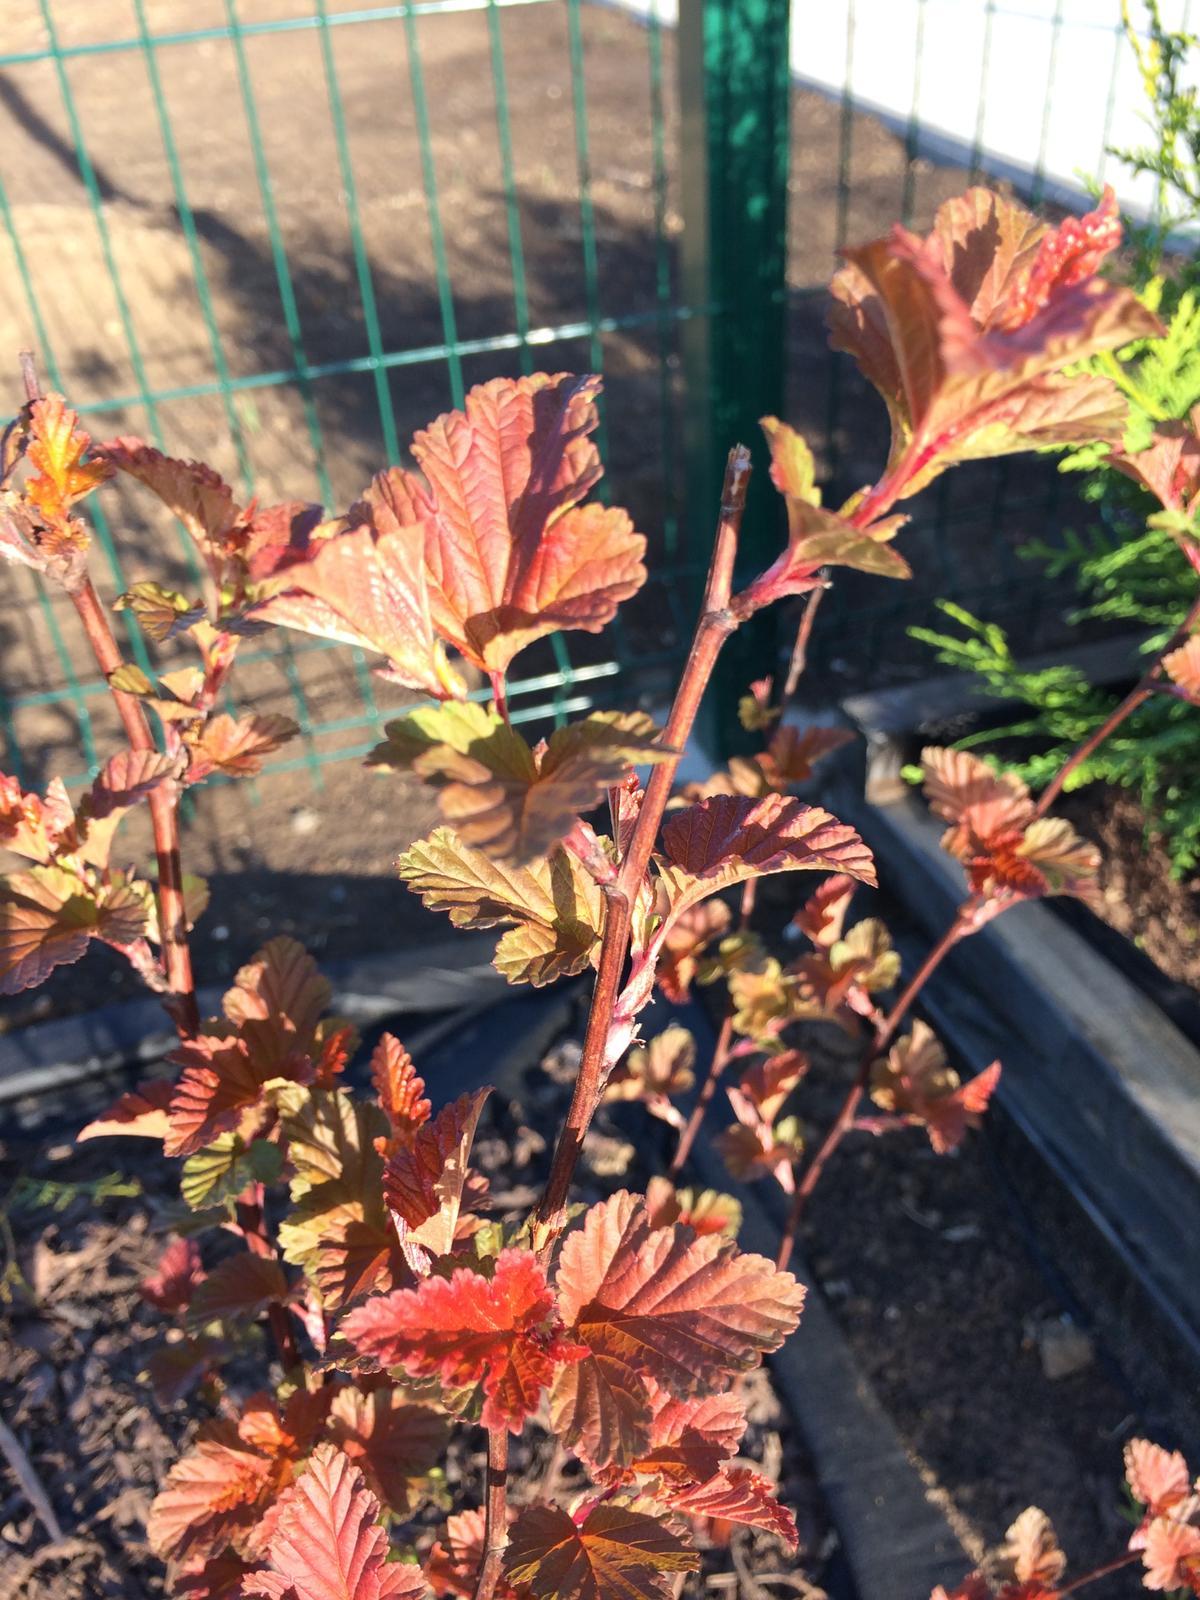 Zahrada- jak to vsechno zacalo.. - moja najvacsia laska.. po tom co sa zafarbila do cervena, sa na nu nemozem vynadivat :)